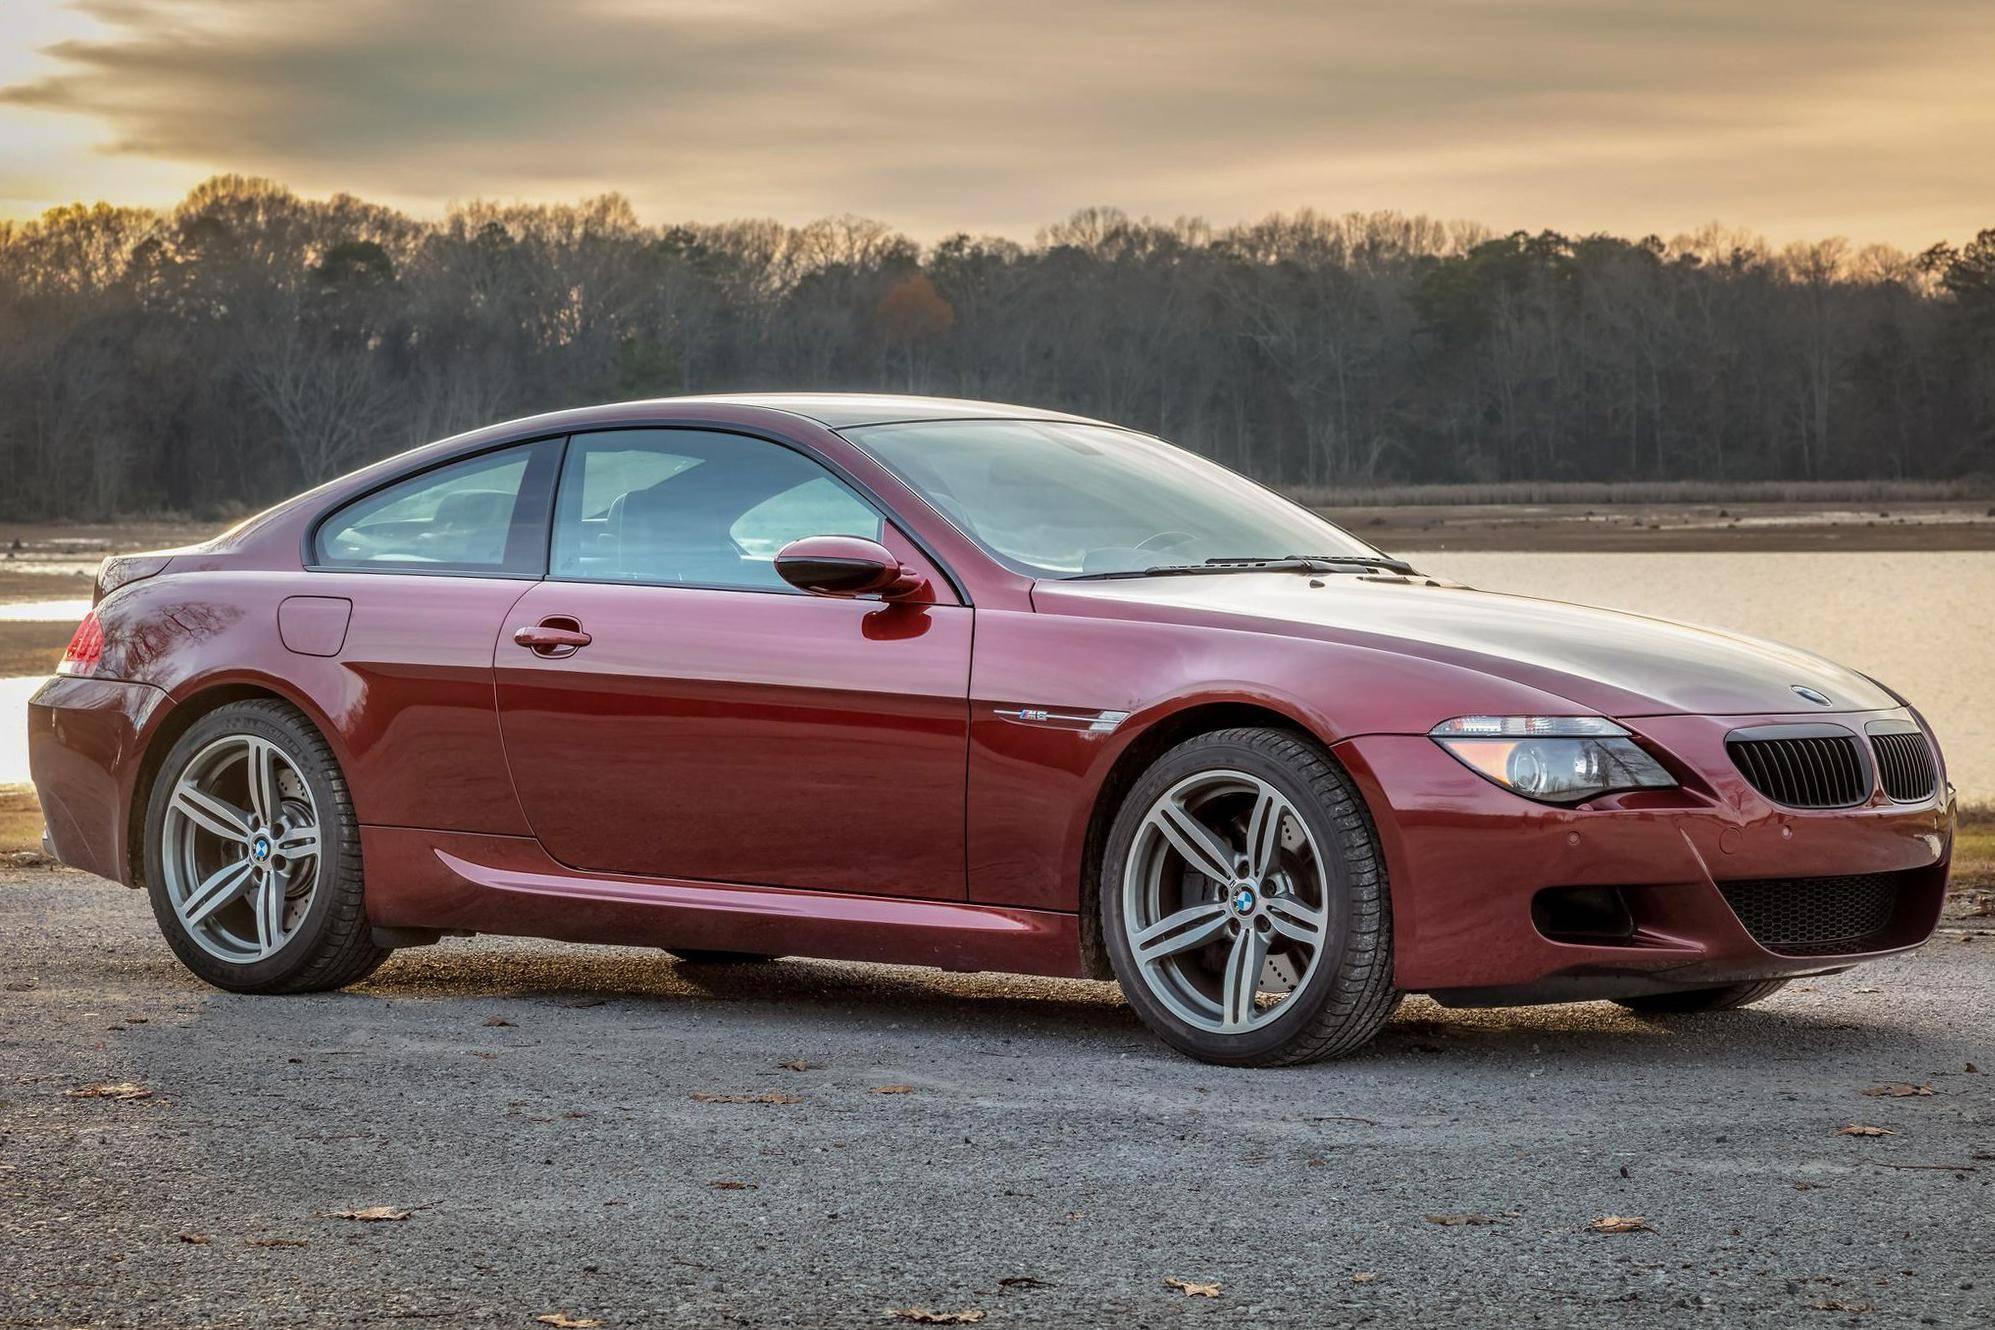 2006 Bmw M6 Coupe Auction Cars Bids